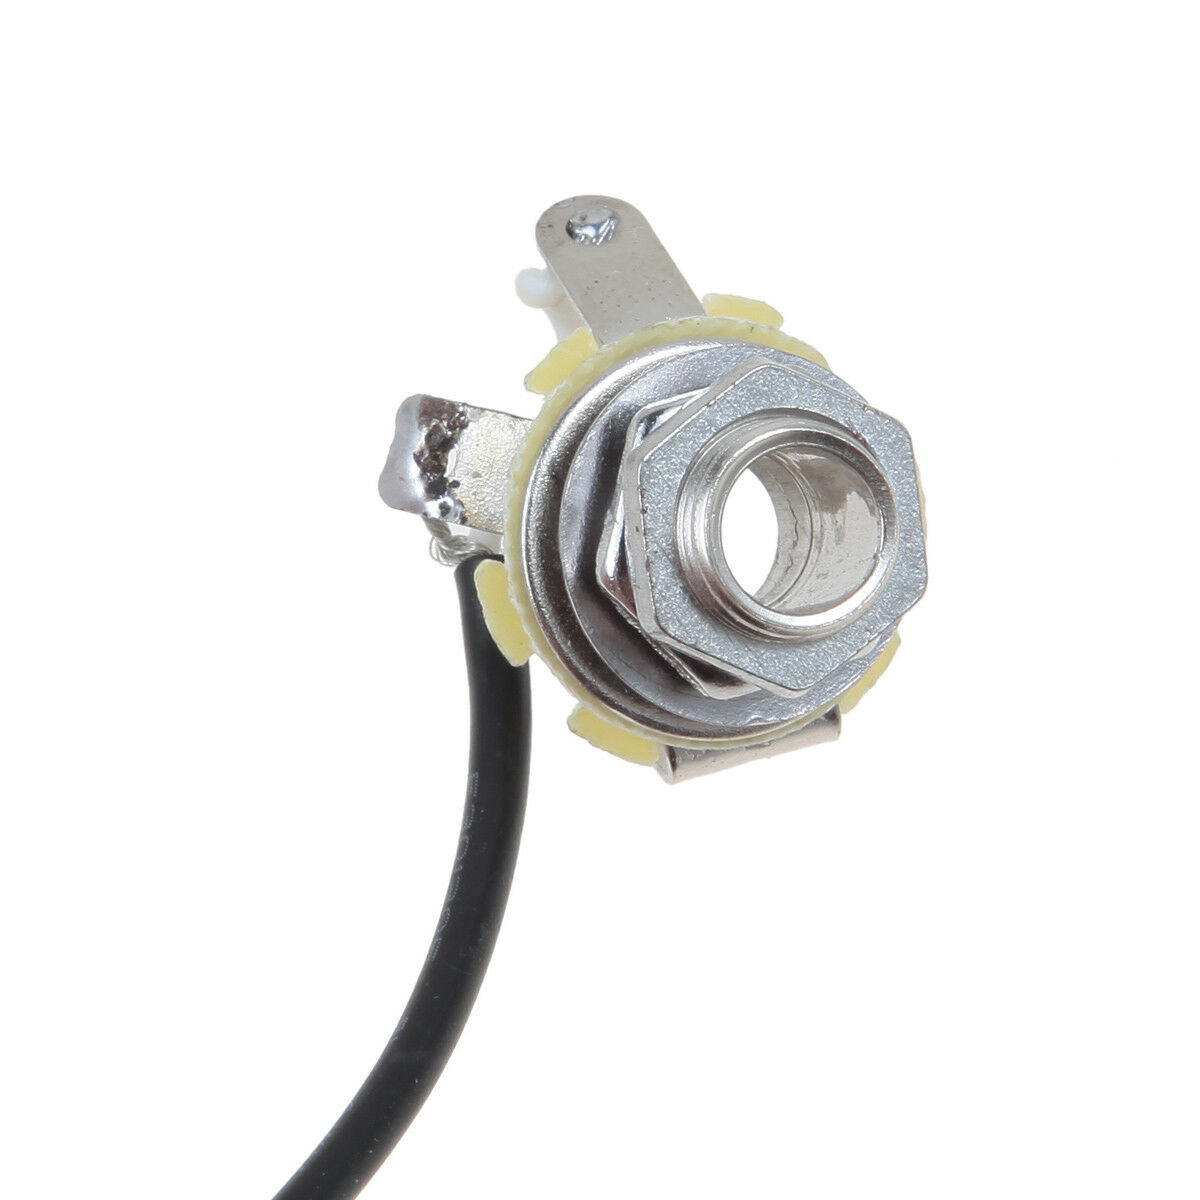 Wiring Harness Pickup 1v2t 5 Way Switch 500k Pots Jack For Fender